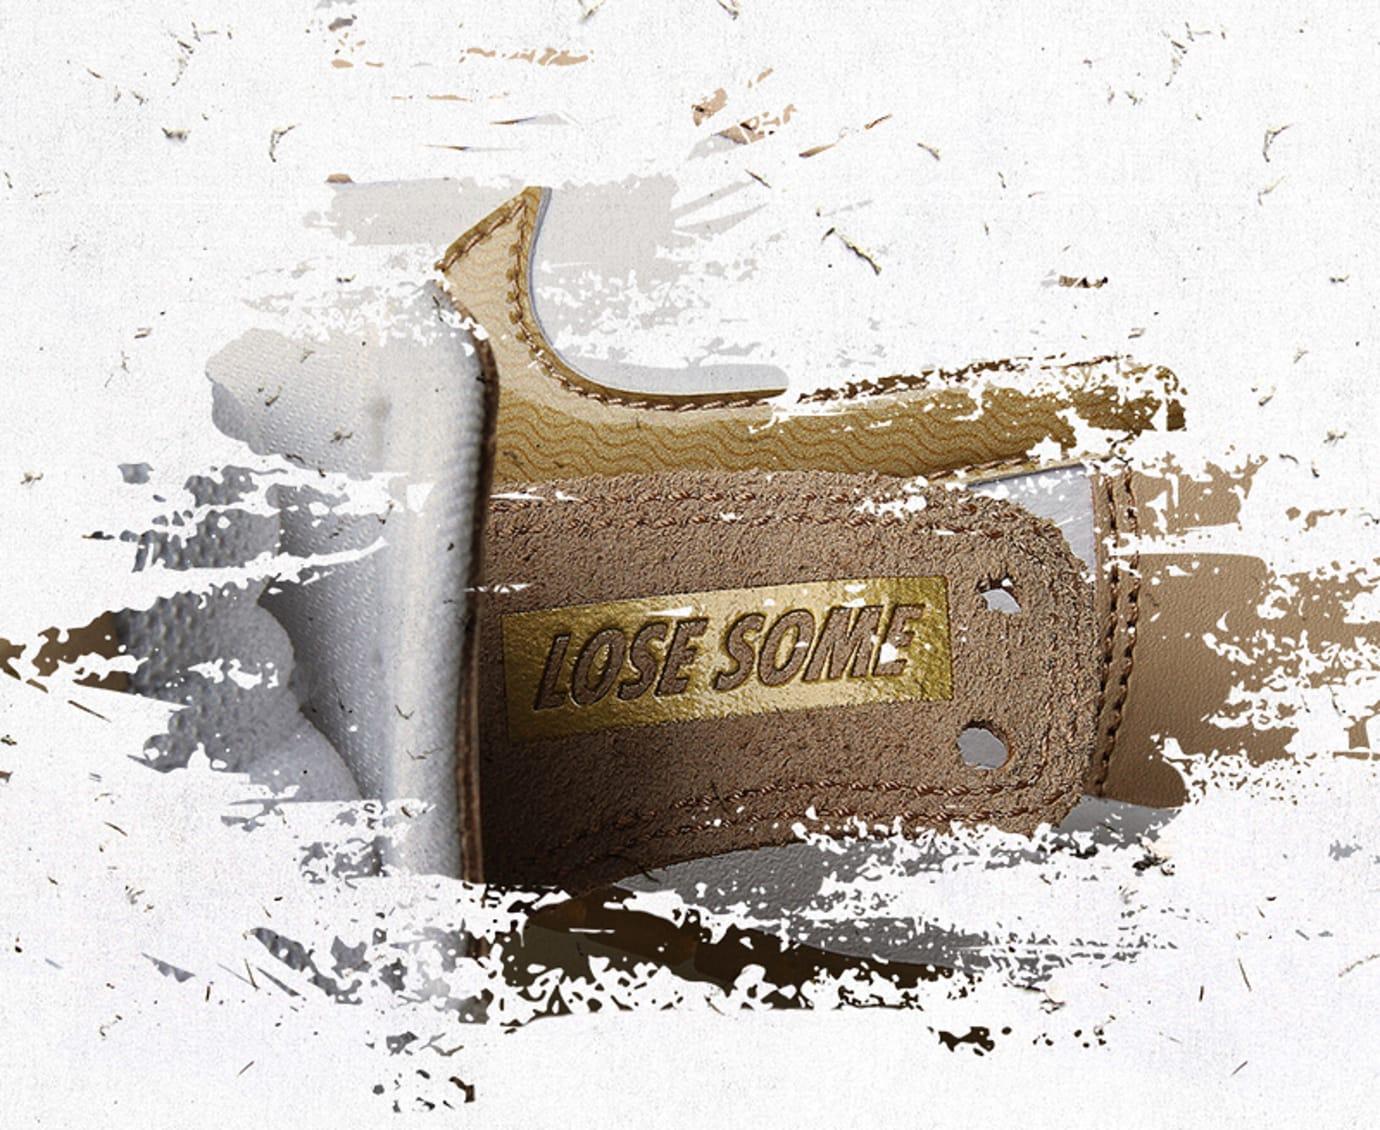 Premier x Nike SB Dunk High TRD (Detail)